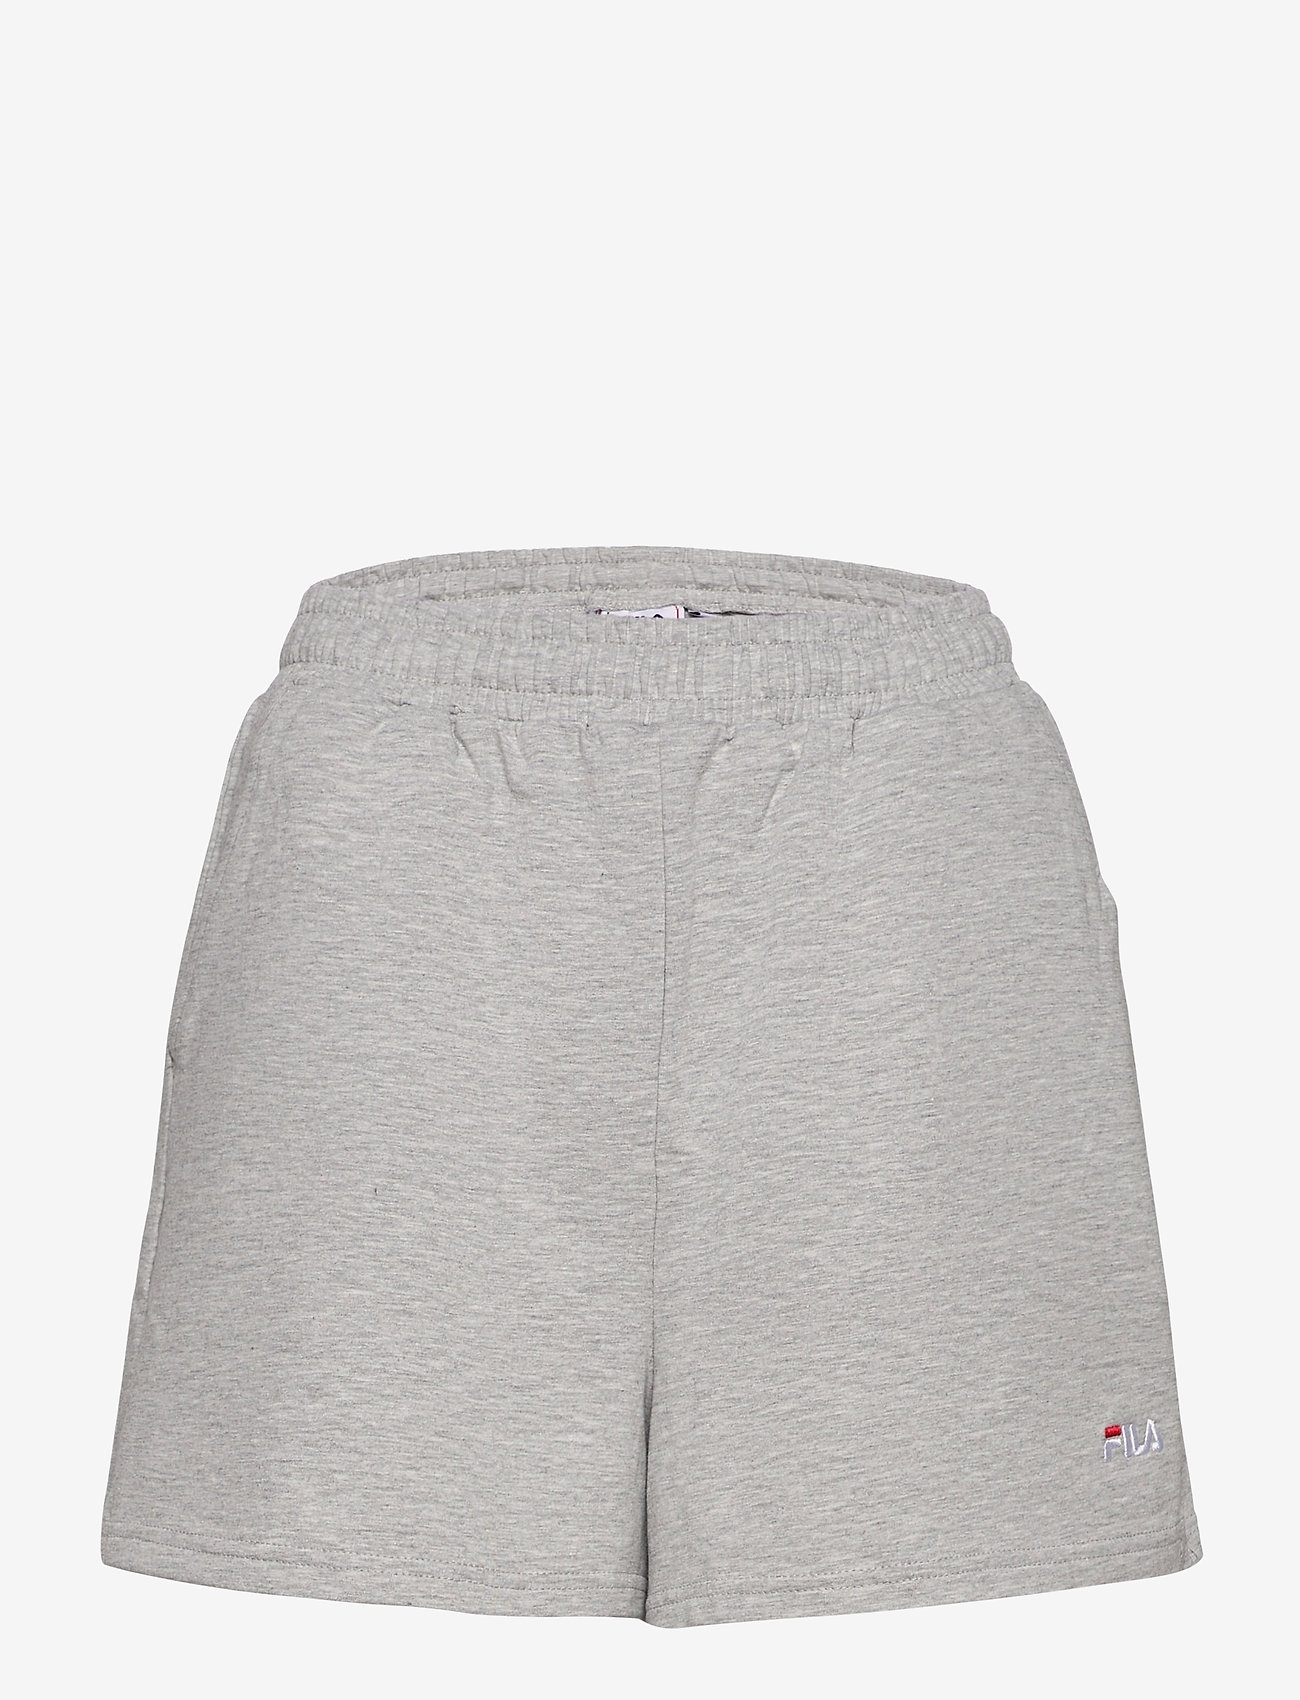 FILA - EDEL shorts high waist - chaussures de course - light grey melange bros - 0